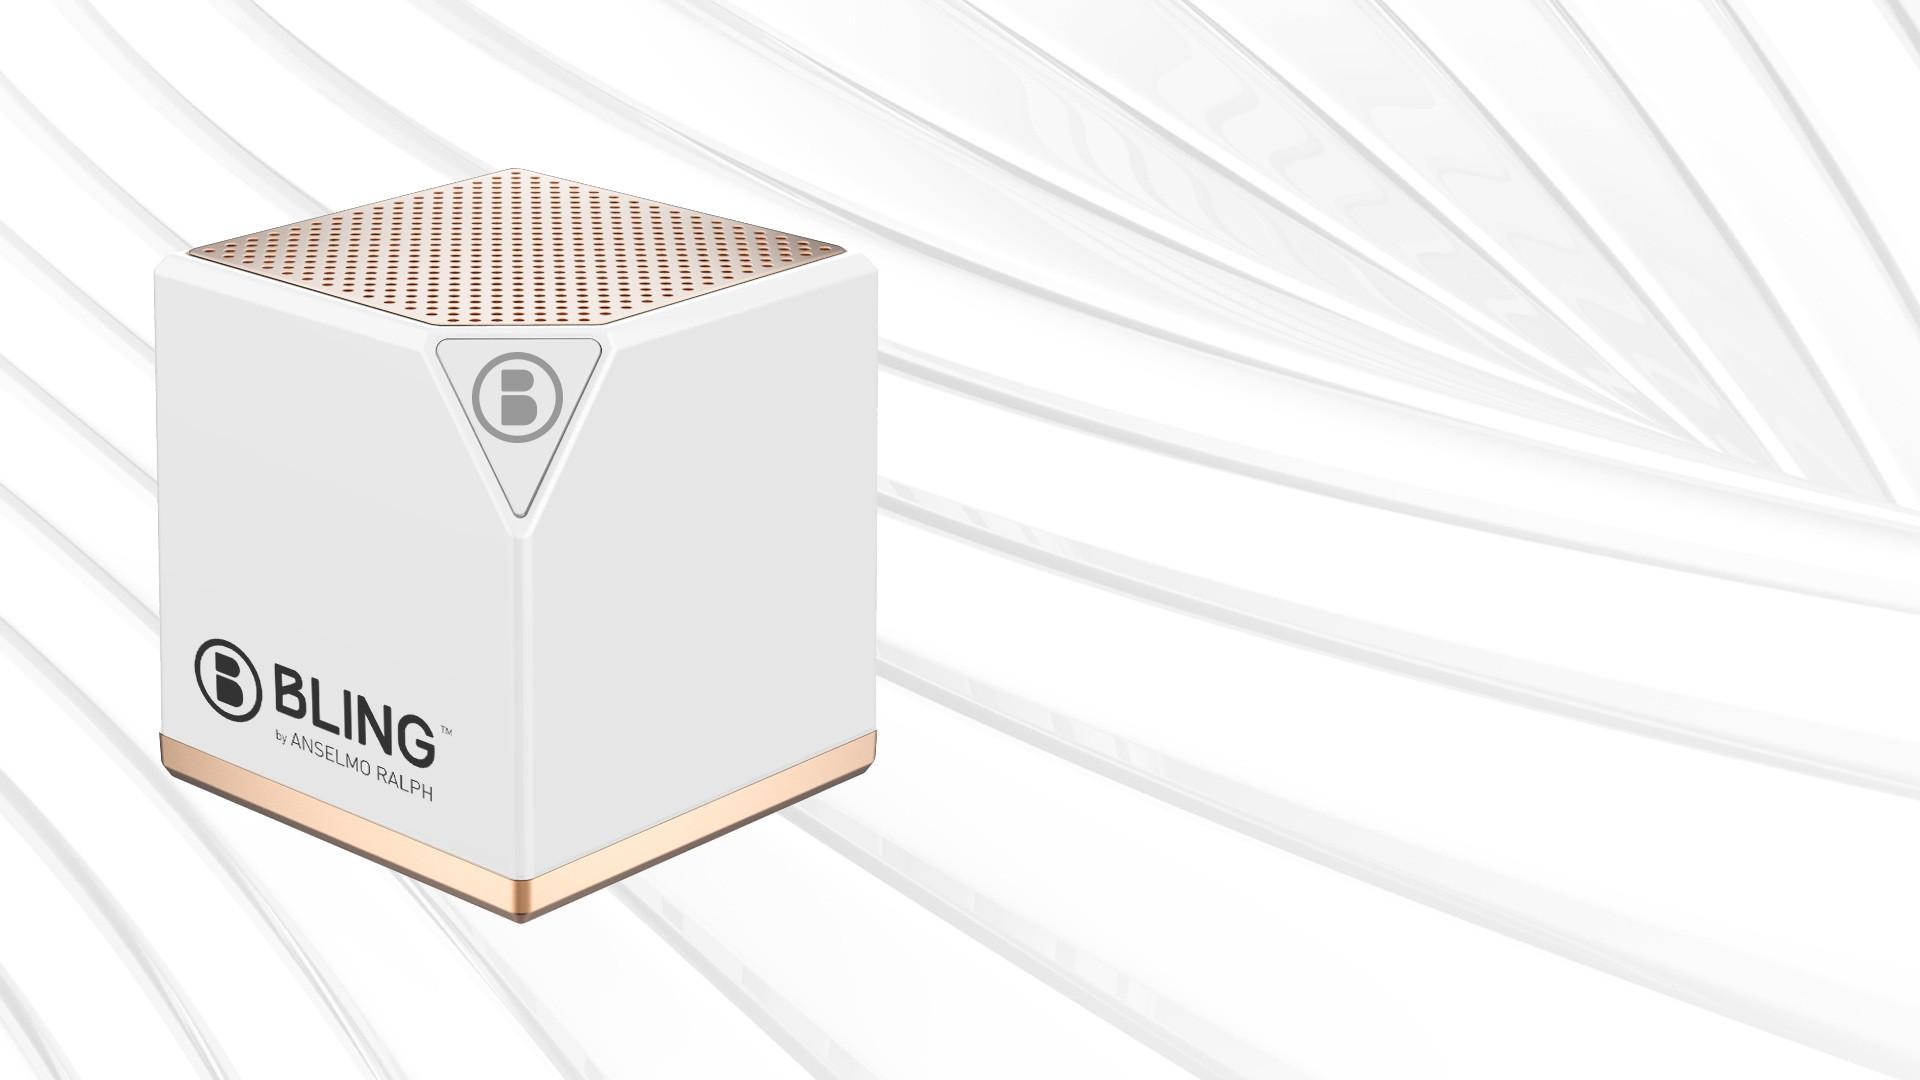 rythm box 05